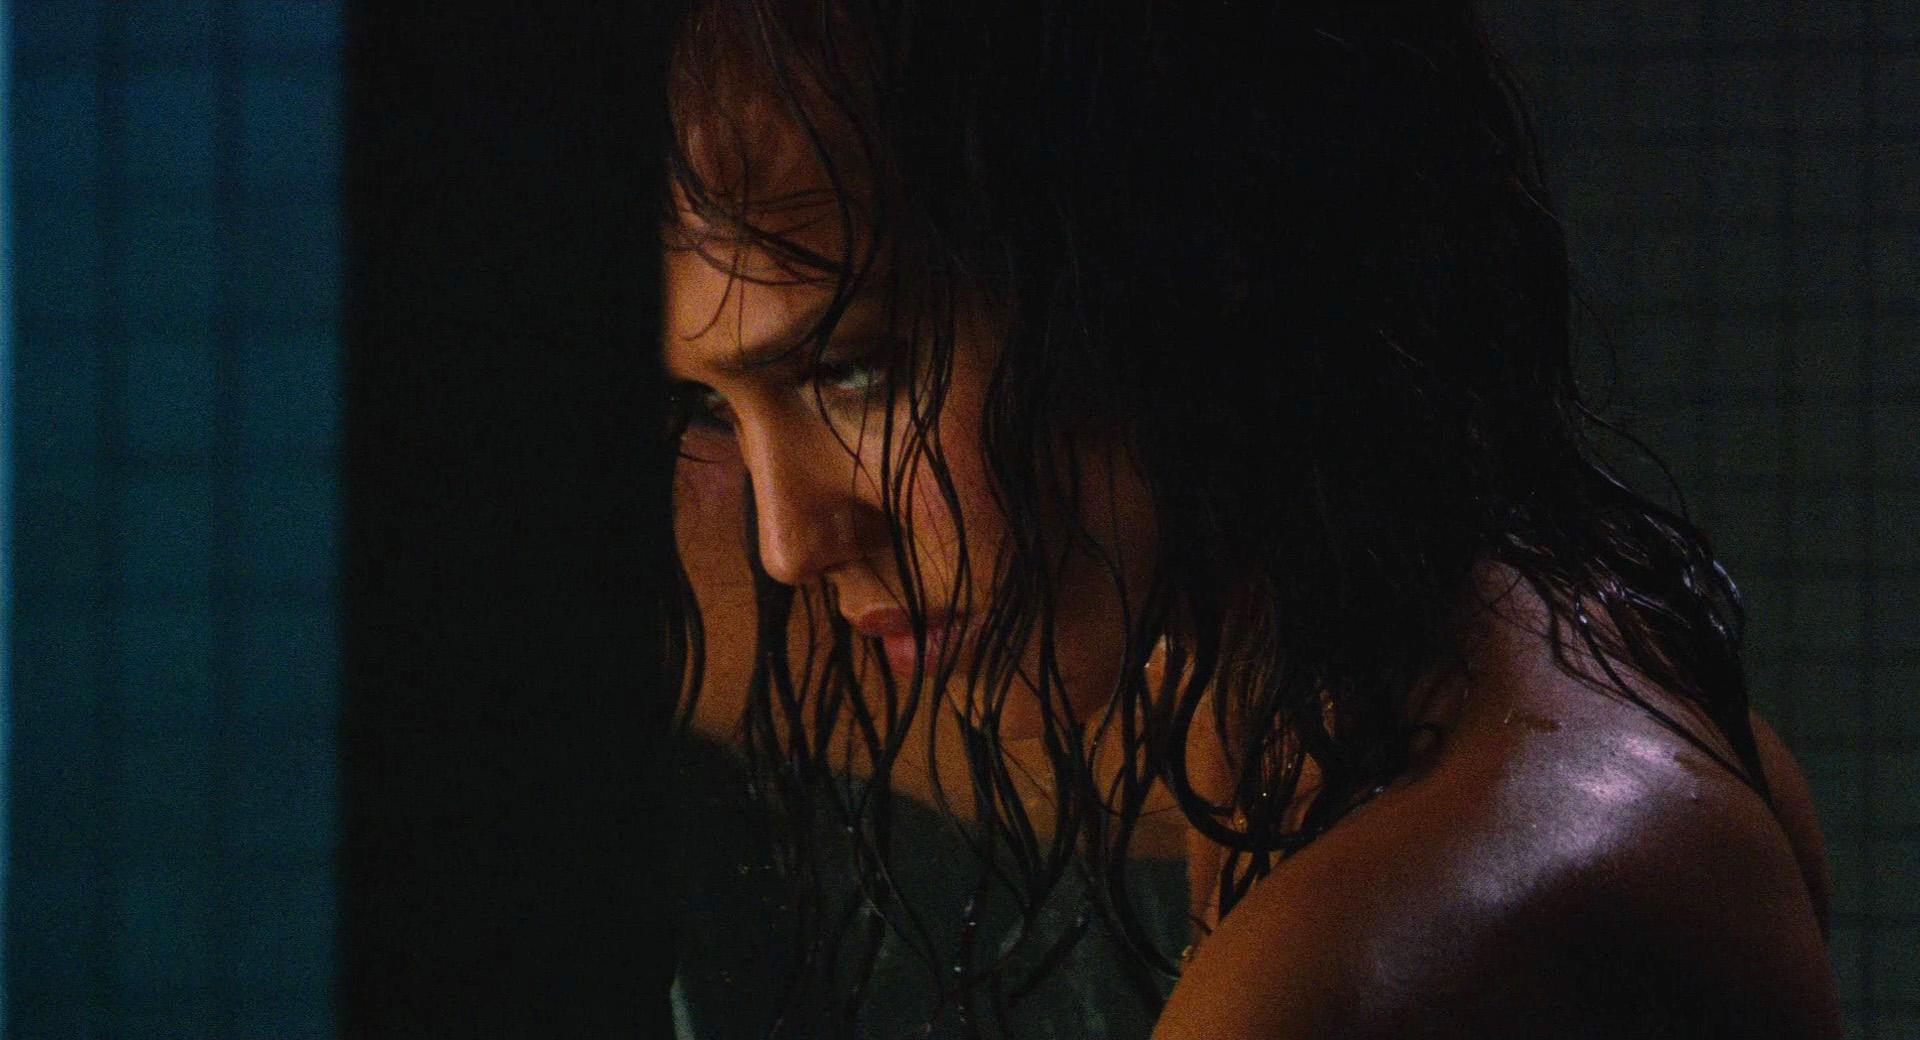 Jessica alba naked in machete